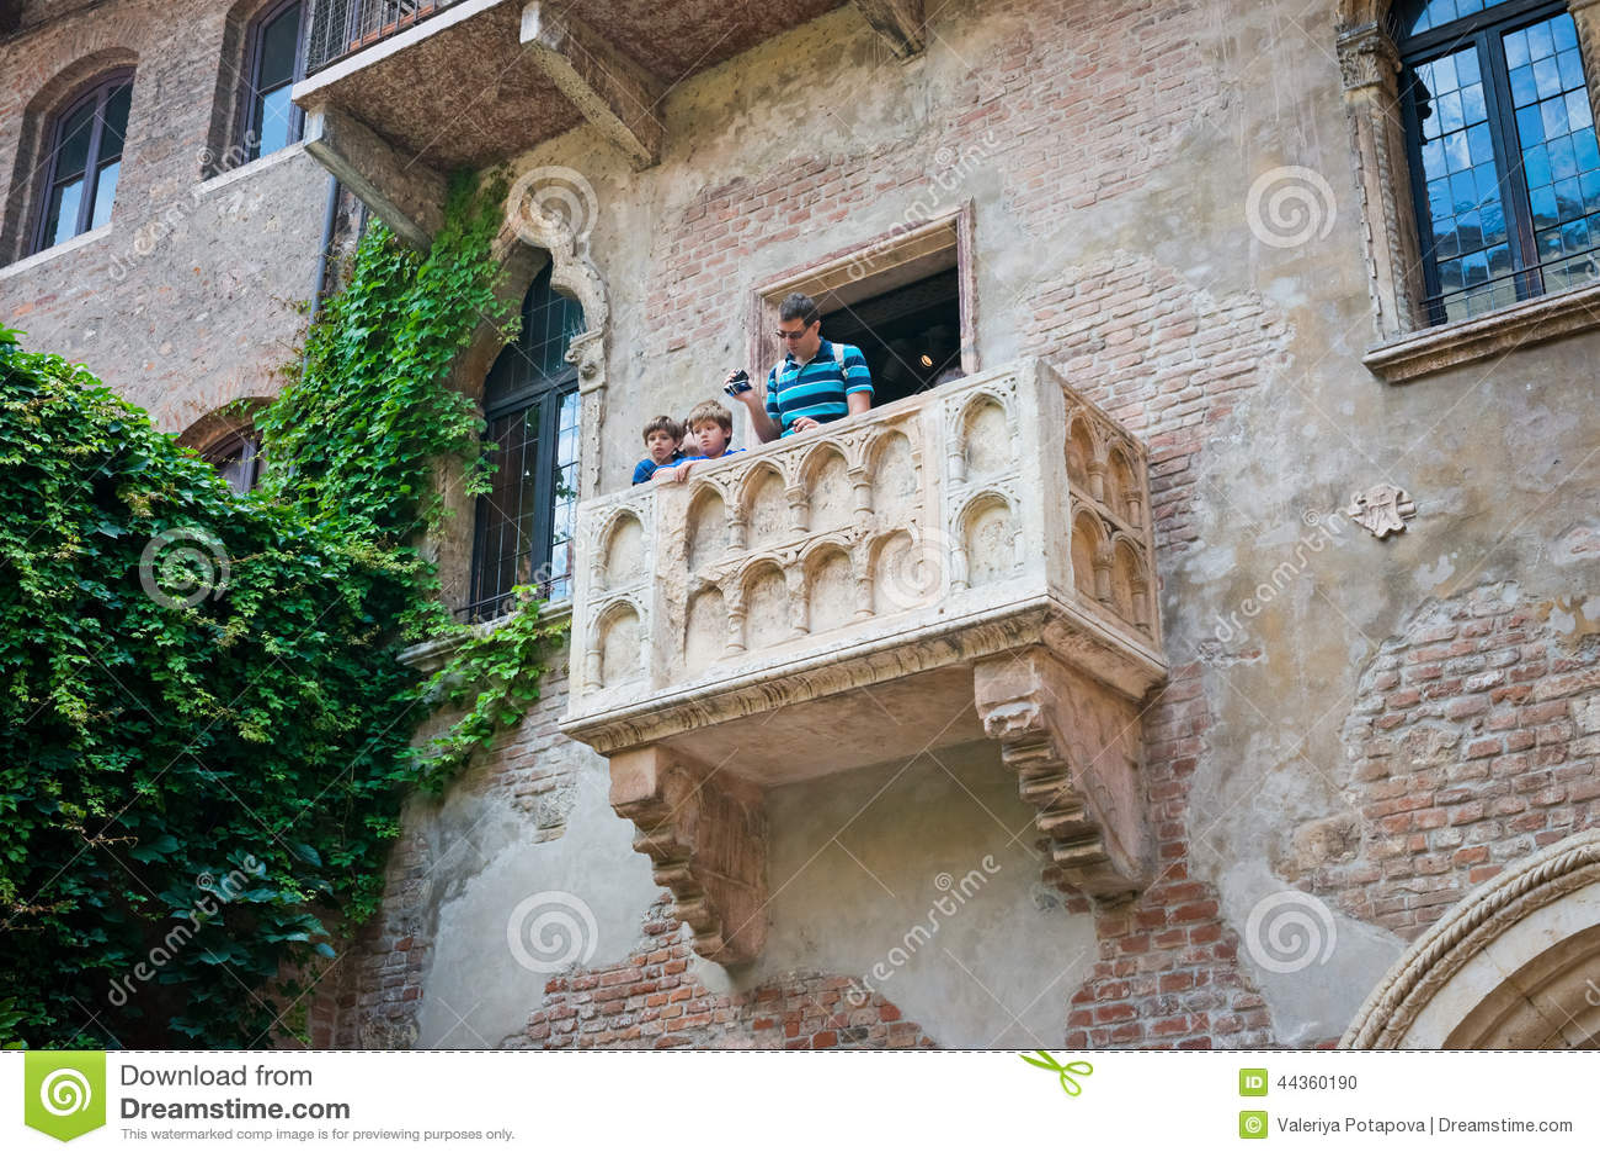 Balcone di Juliet con i turists a Verona